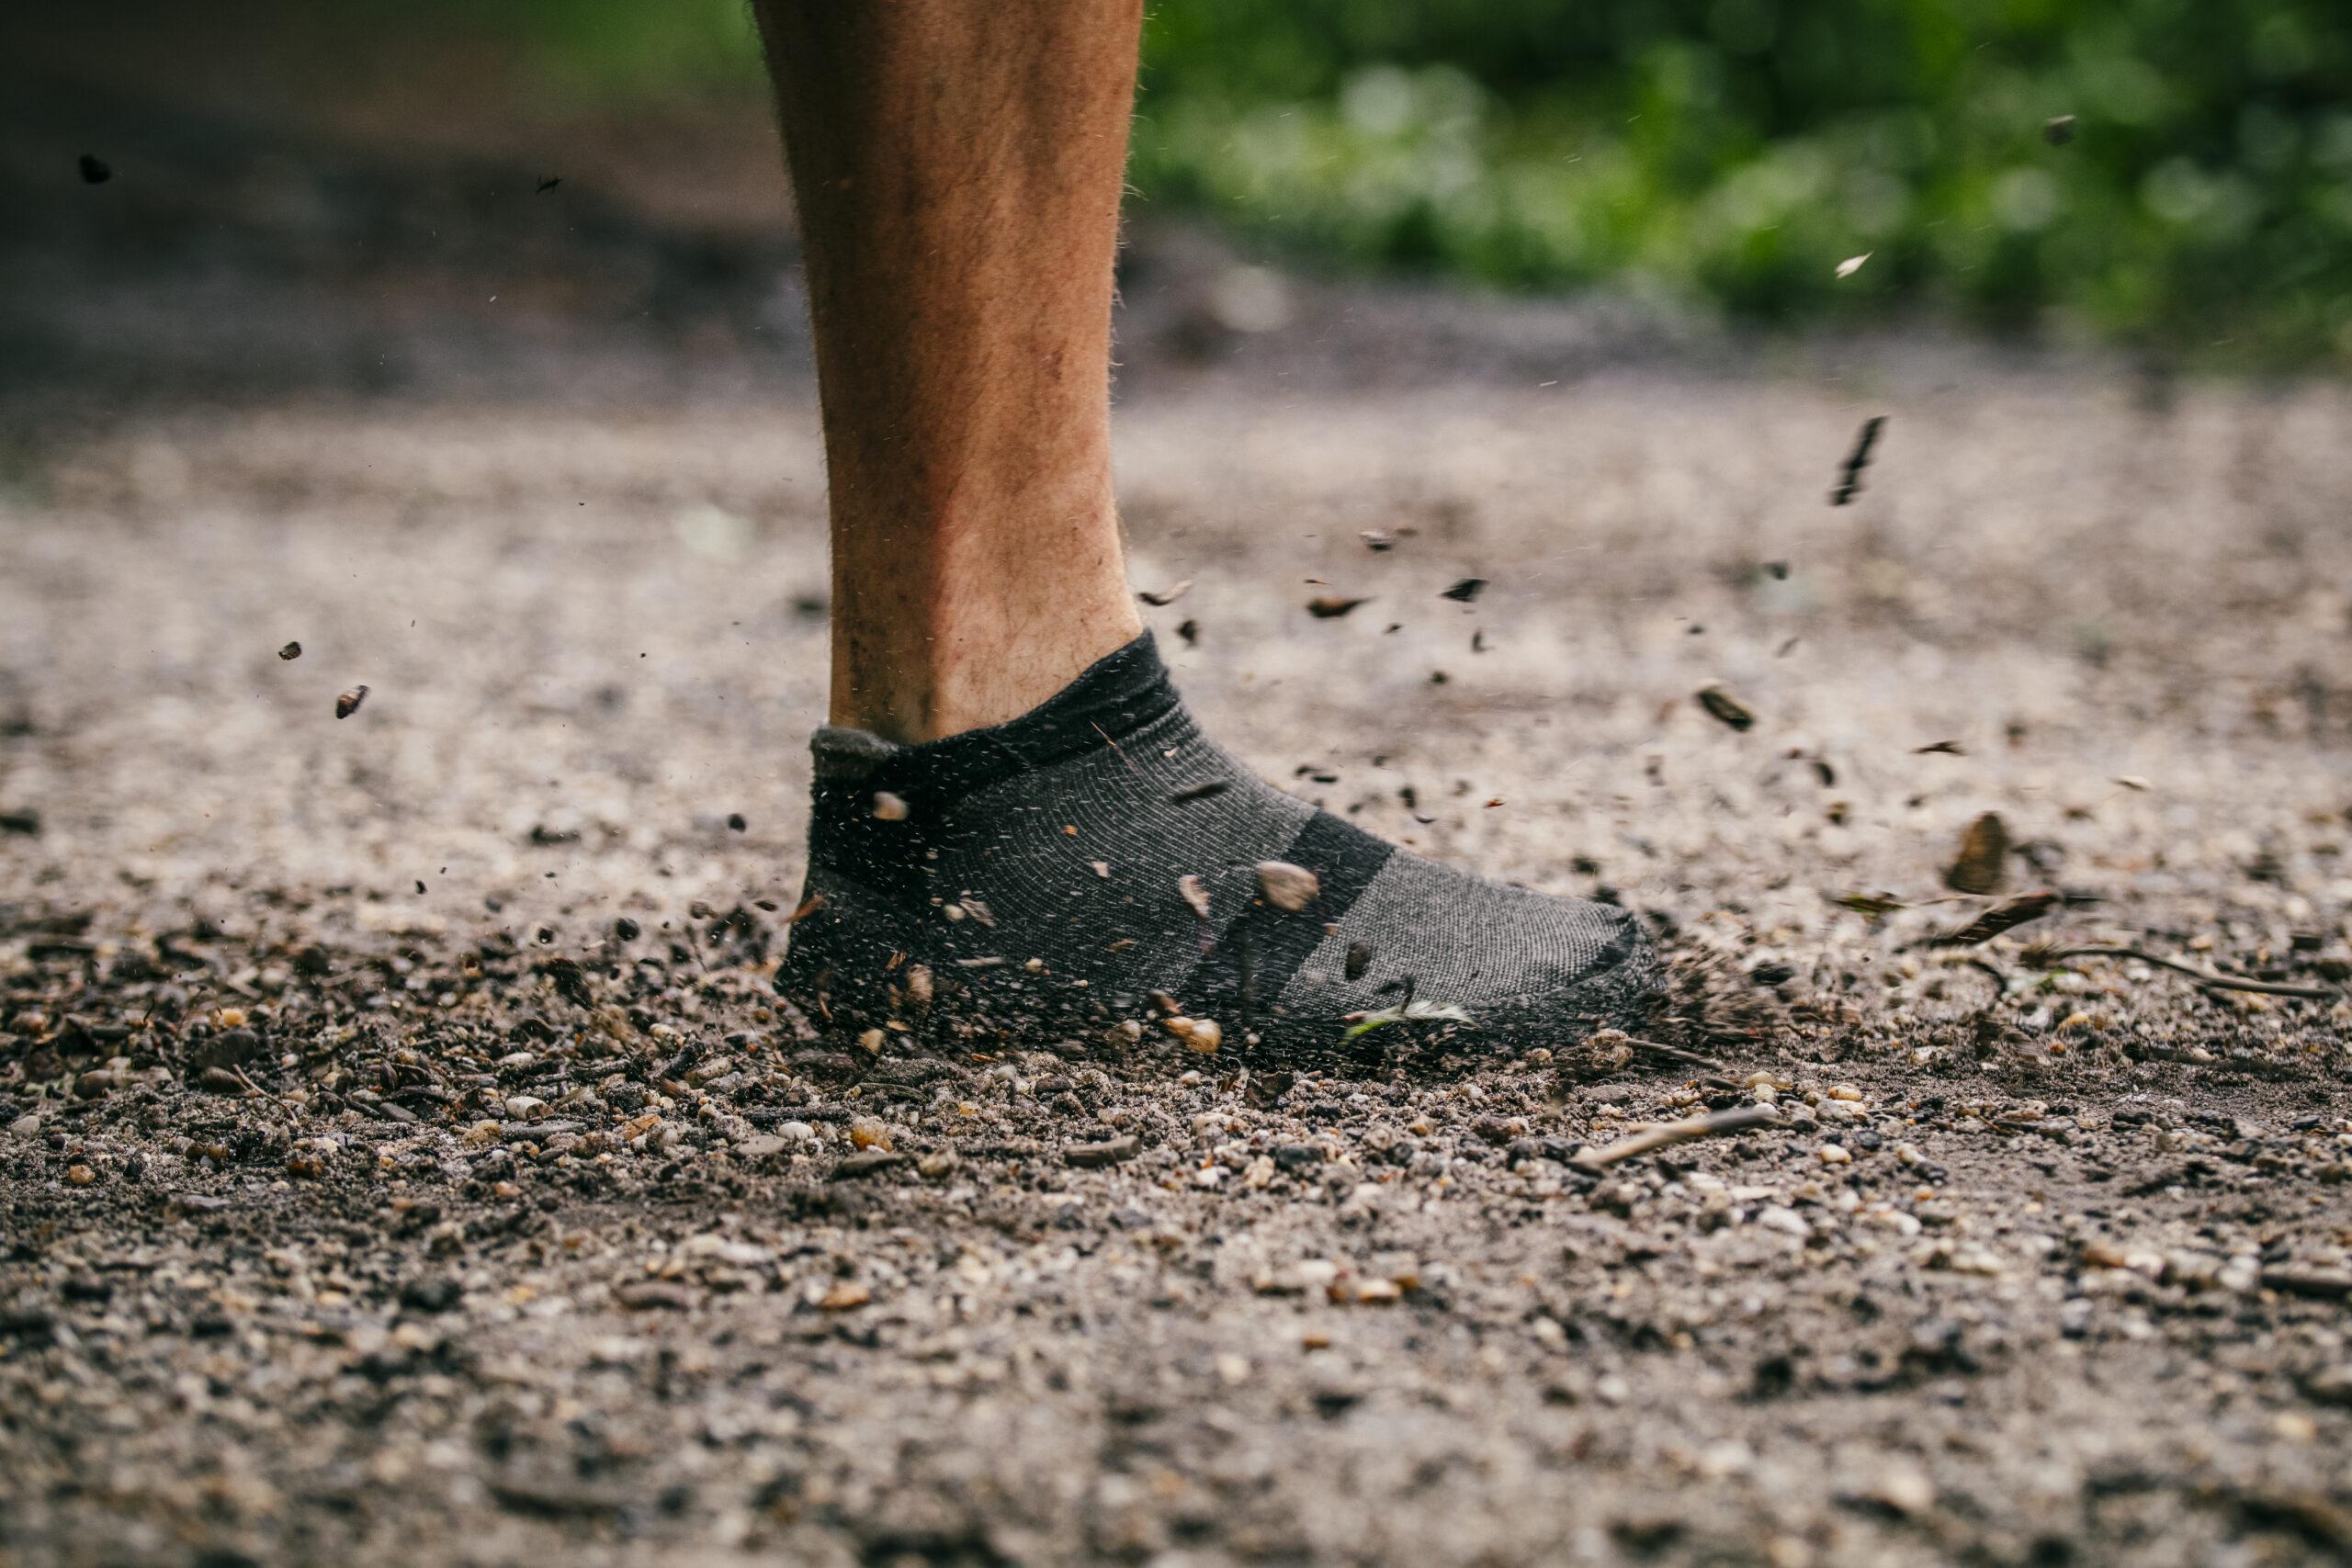 Grab Versatile Bare Socks To Feel The Nature